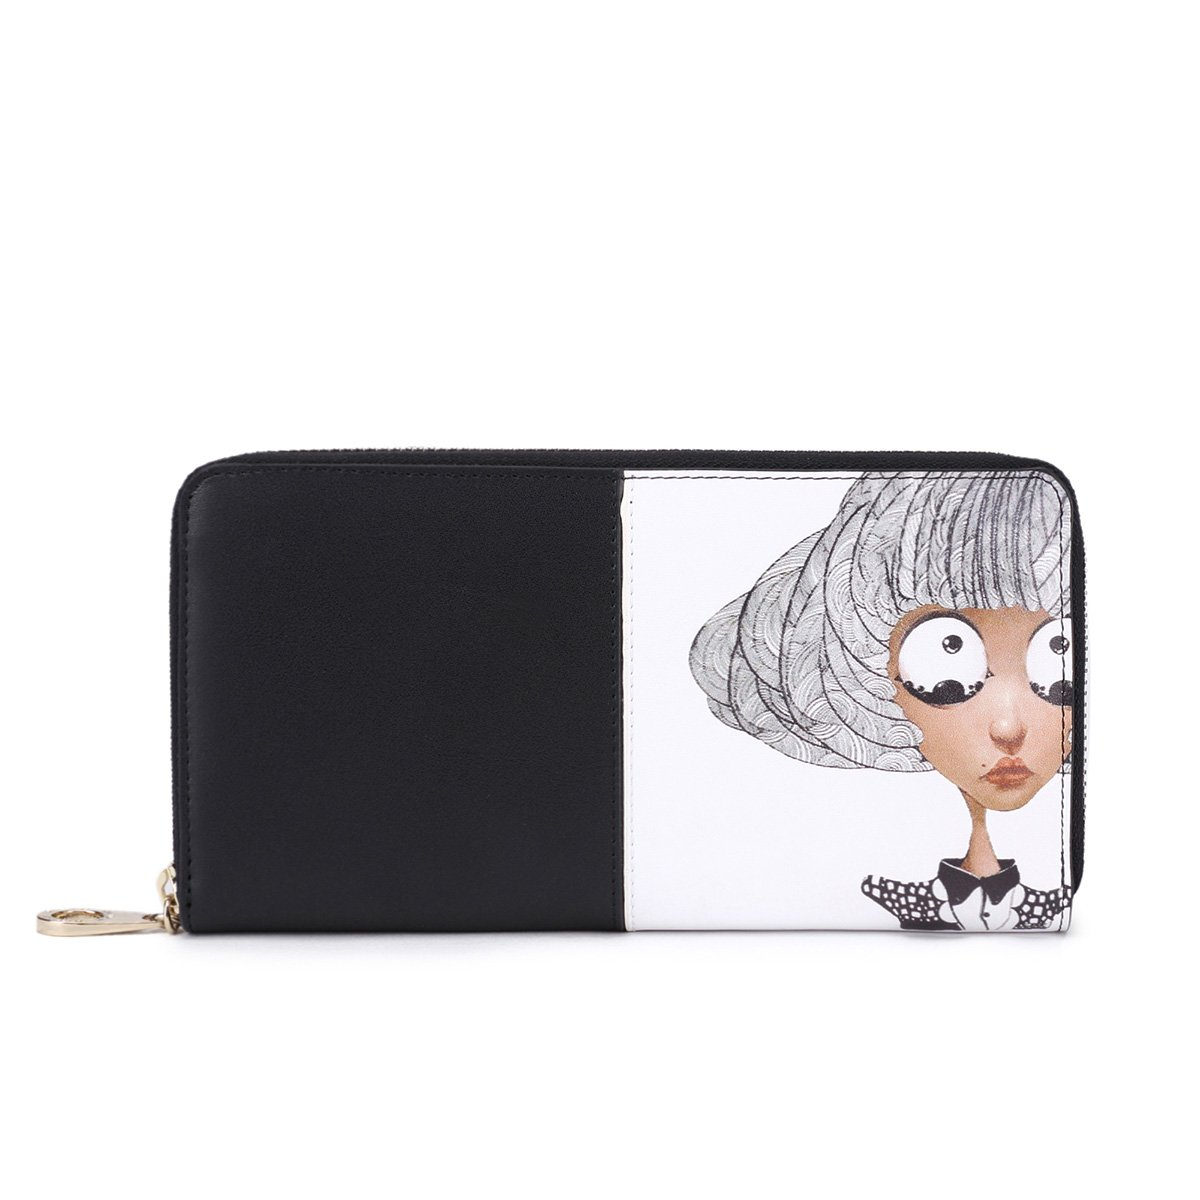 Cat Wallet For Women Cute Zip Purse Leather Handbag Card Bag Large Clutch  Black By Qianbh  Amazon.in  Shoes   Handbags 749a1b64d9723